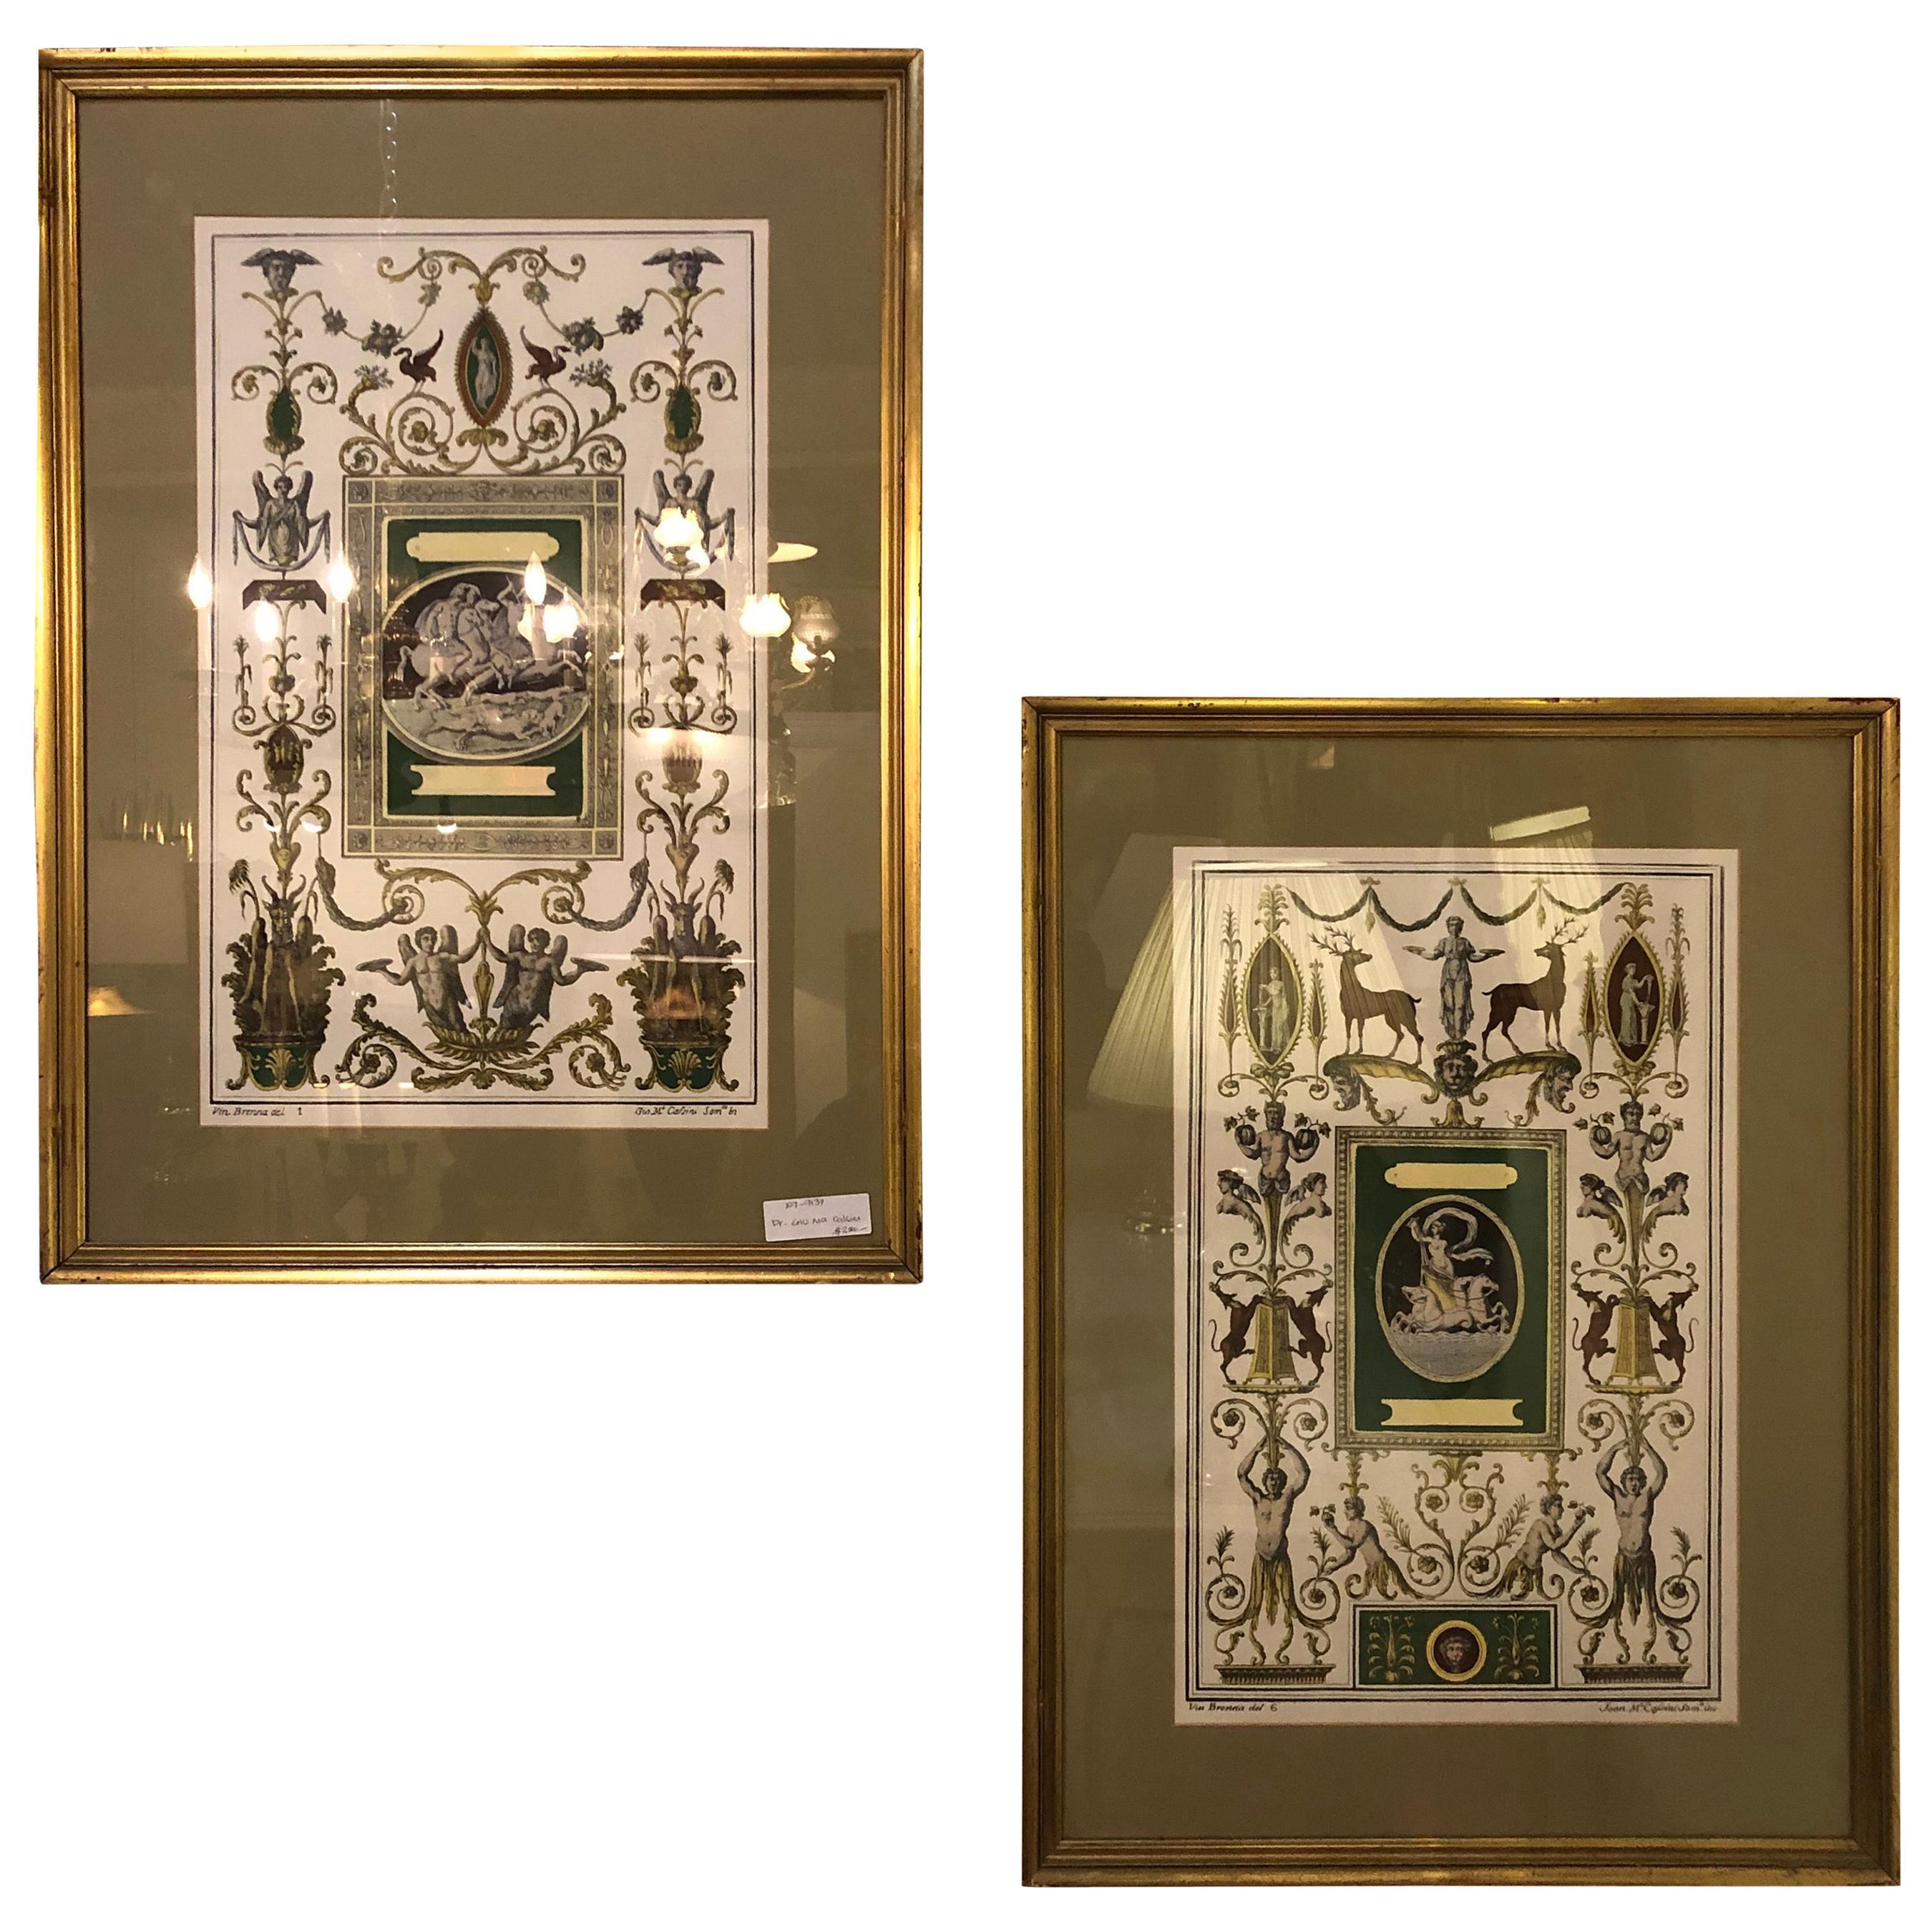 Pair of Italian Engravings Signed Gio Ma Calsini in Gilt Frames